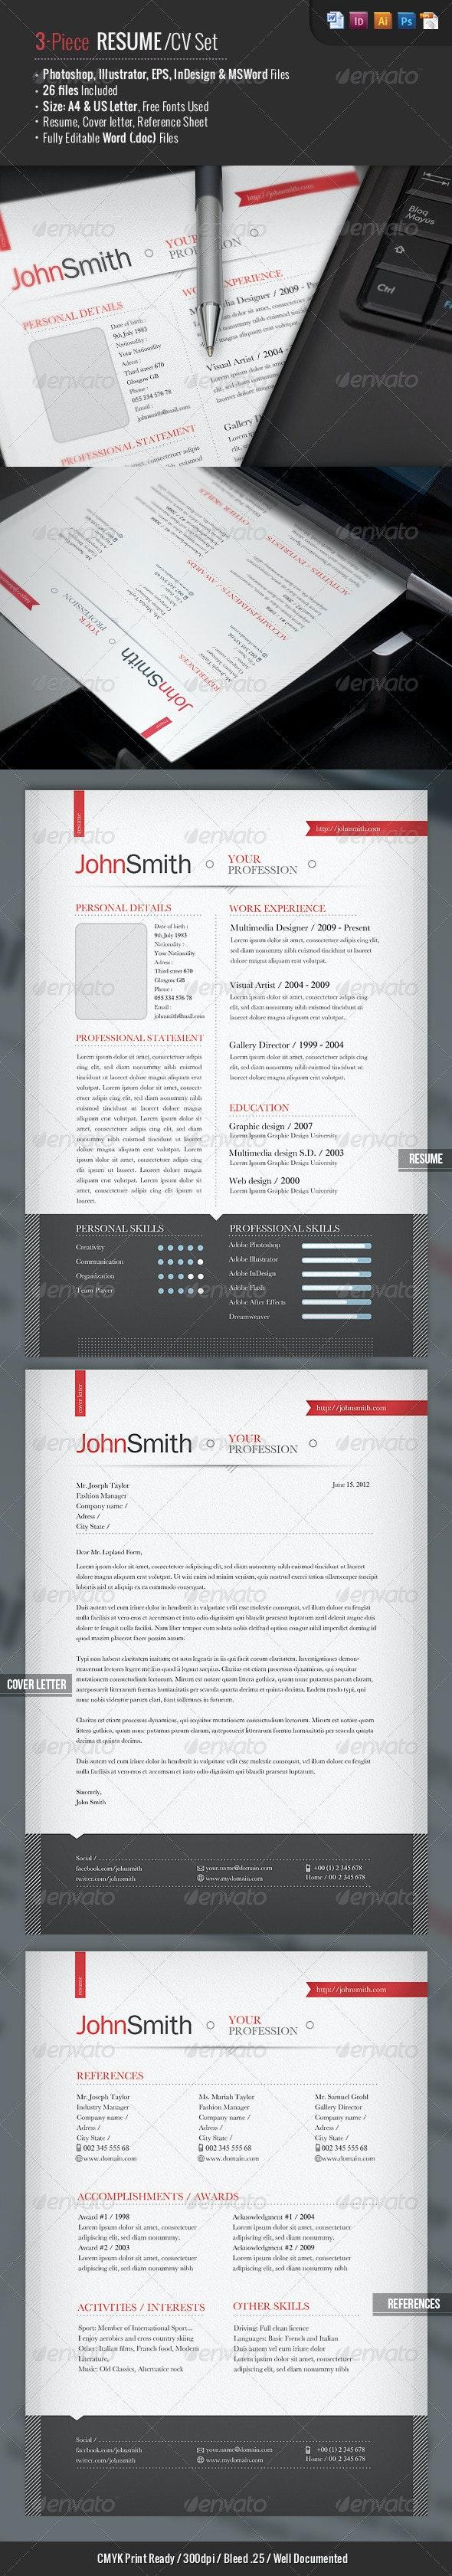 Ready 3-Piece Resume/CV Set - Resumes Stationery